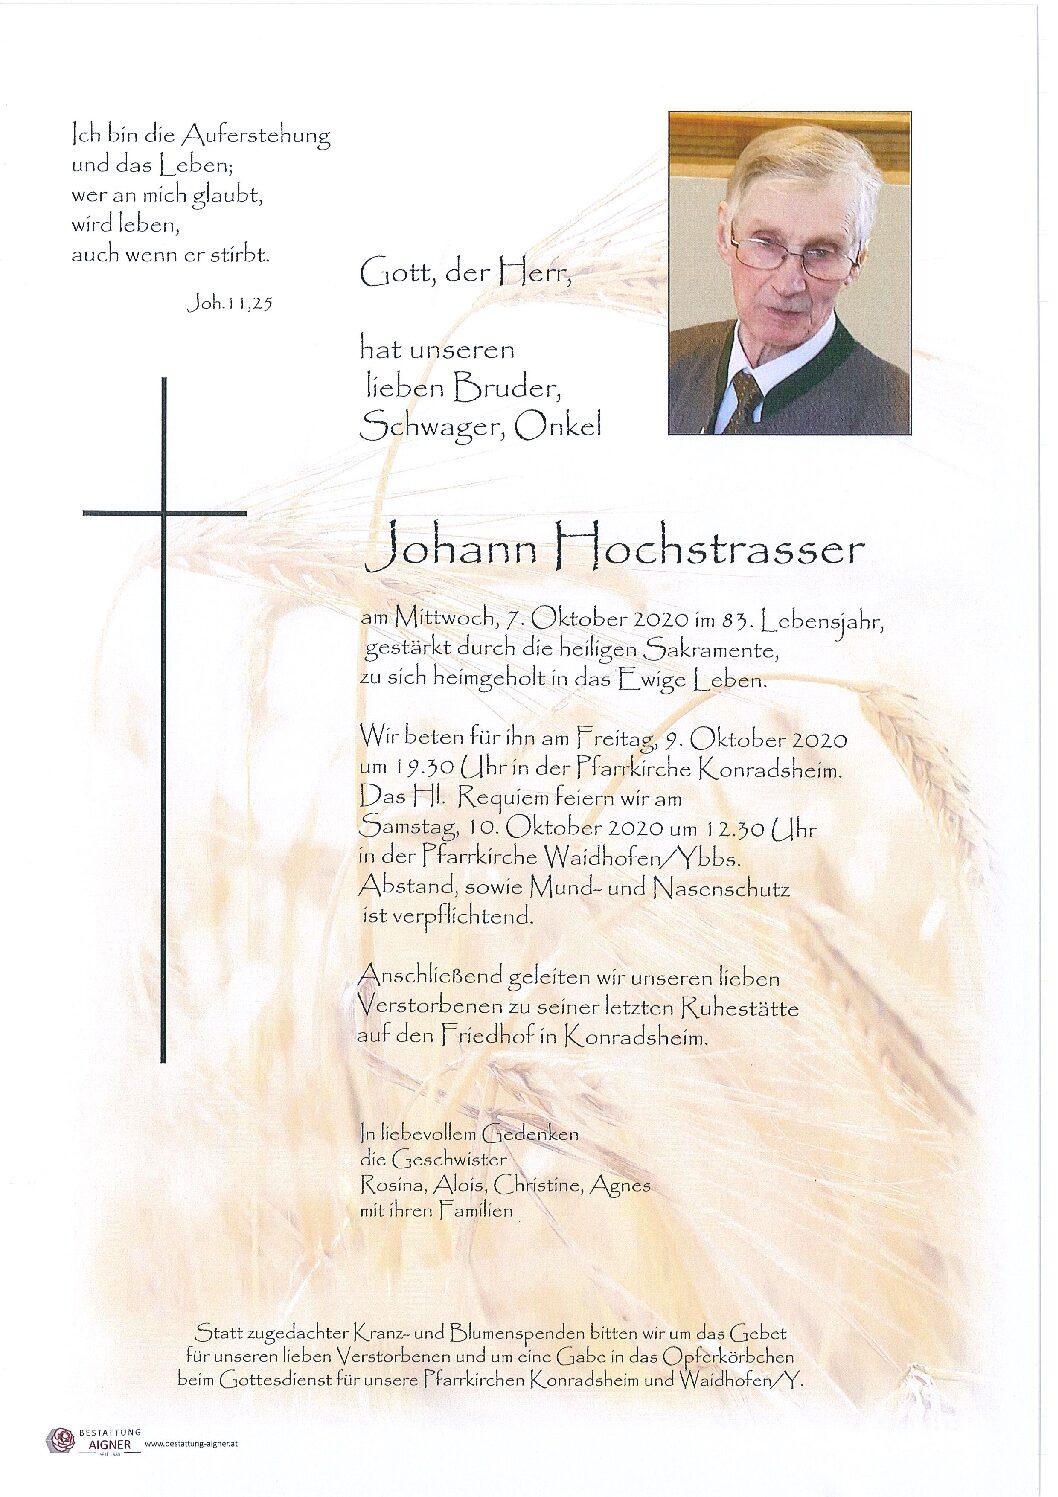 Johann Hochstrasser